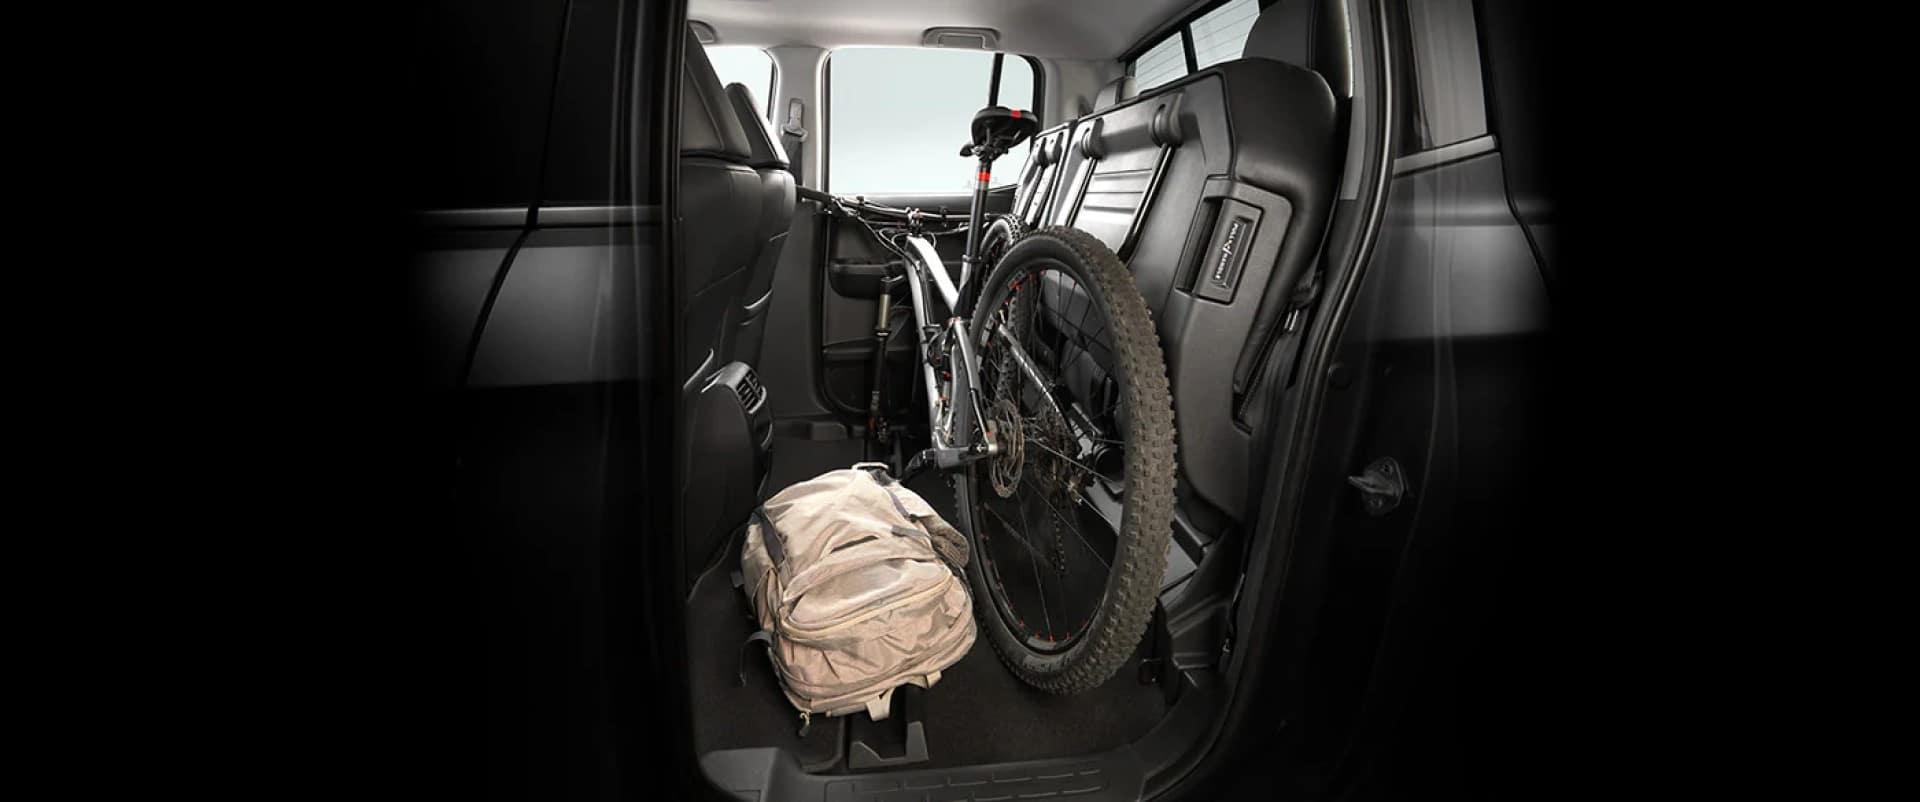 Honda_Ridgeline_Interior_Rear_Seats_Folded